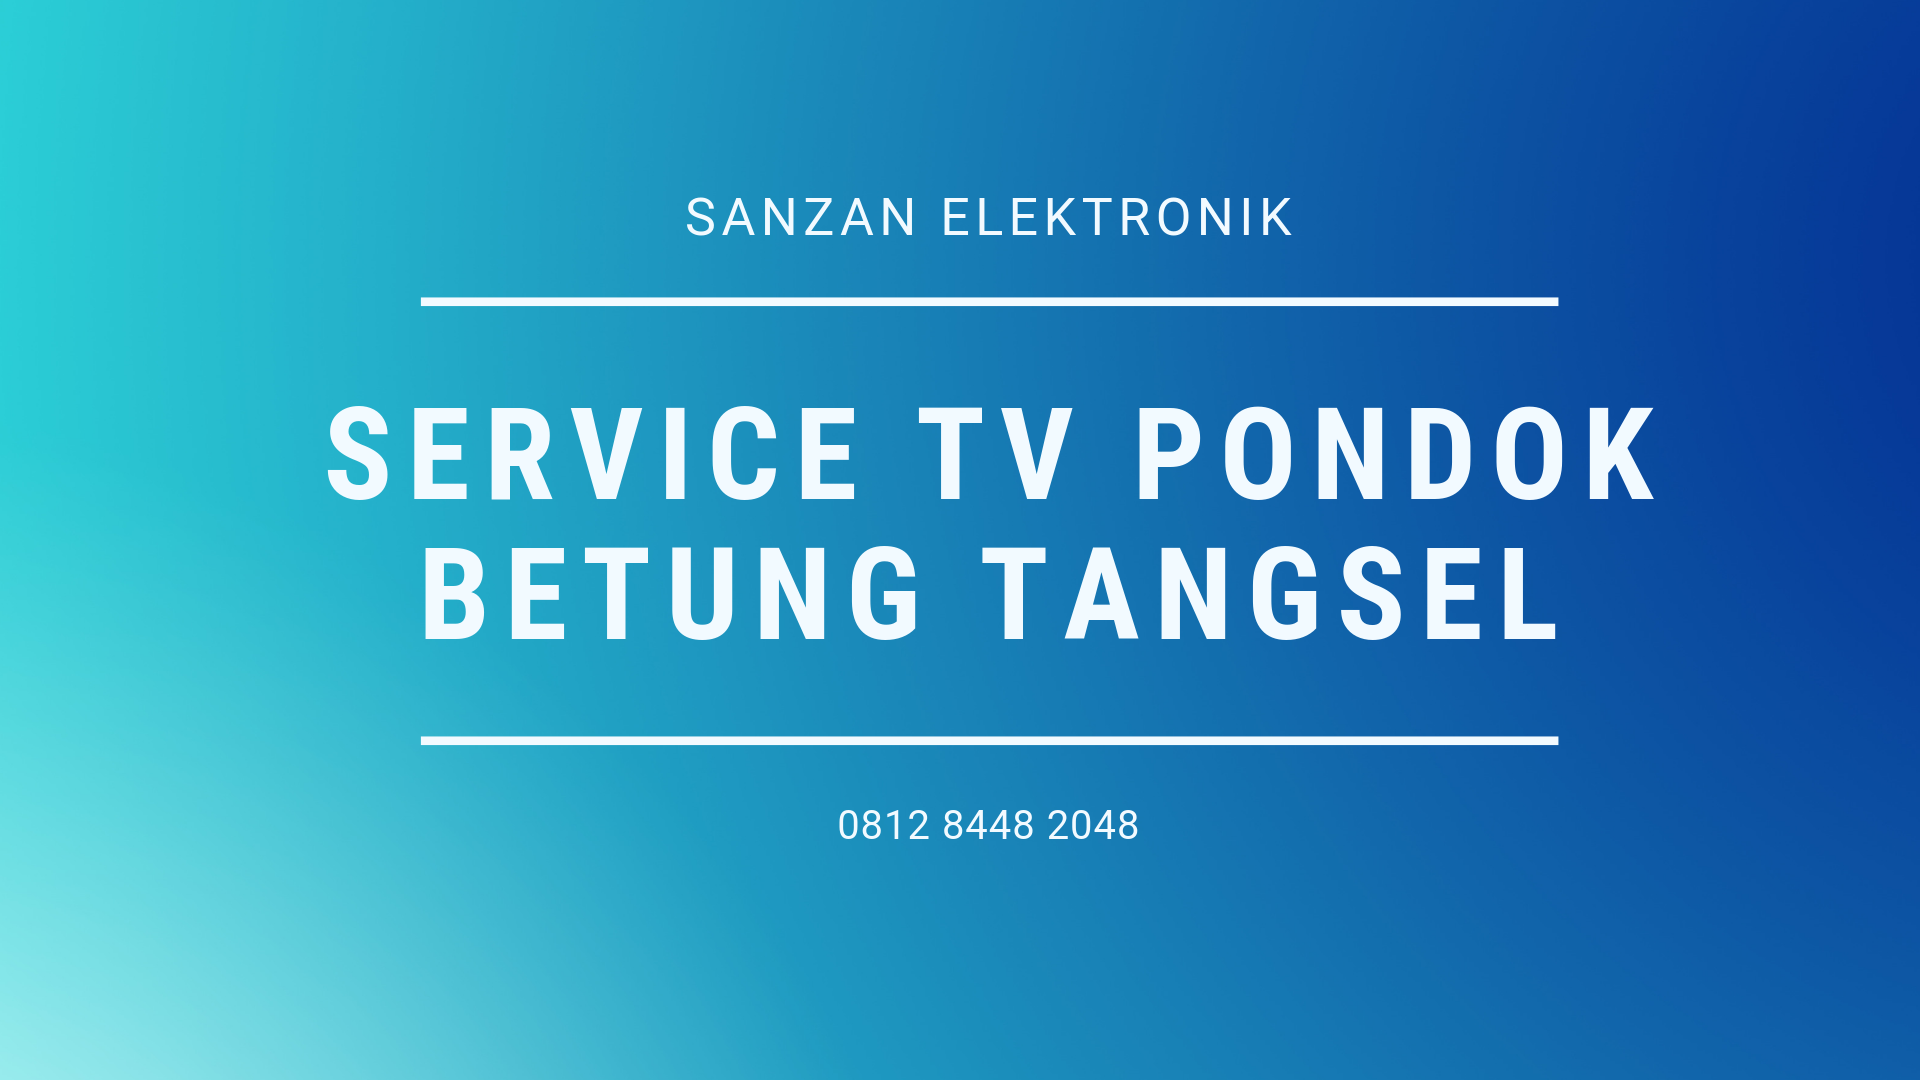 Service Tv Pondok Betung Tangsel